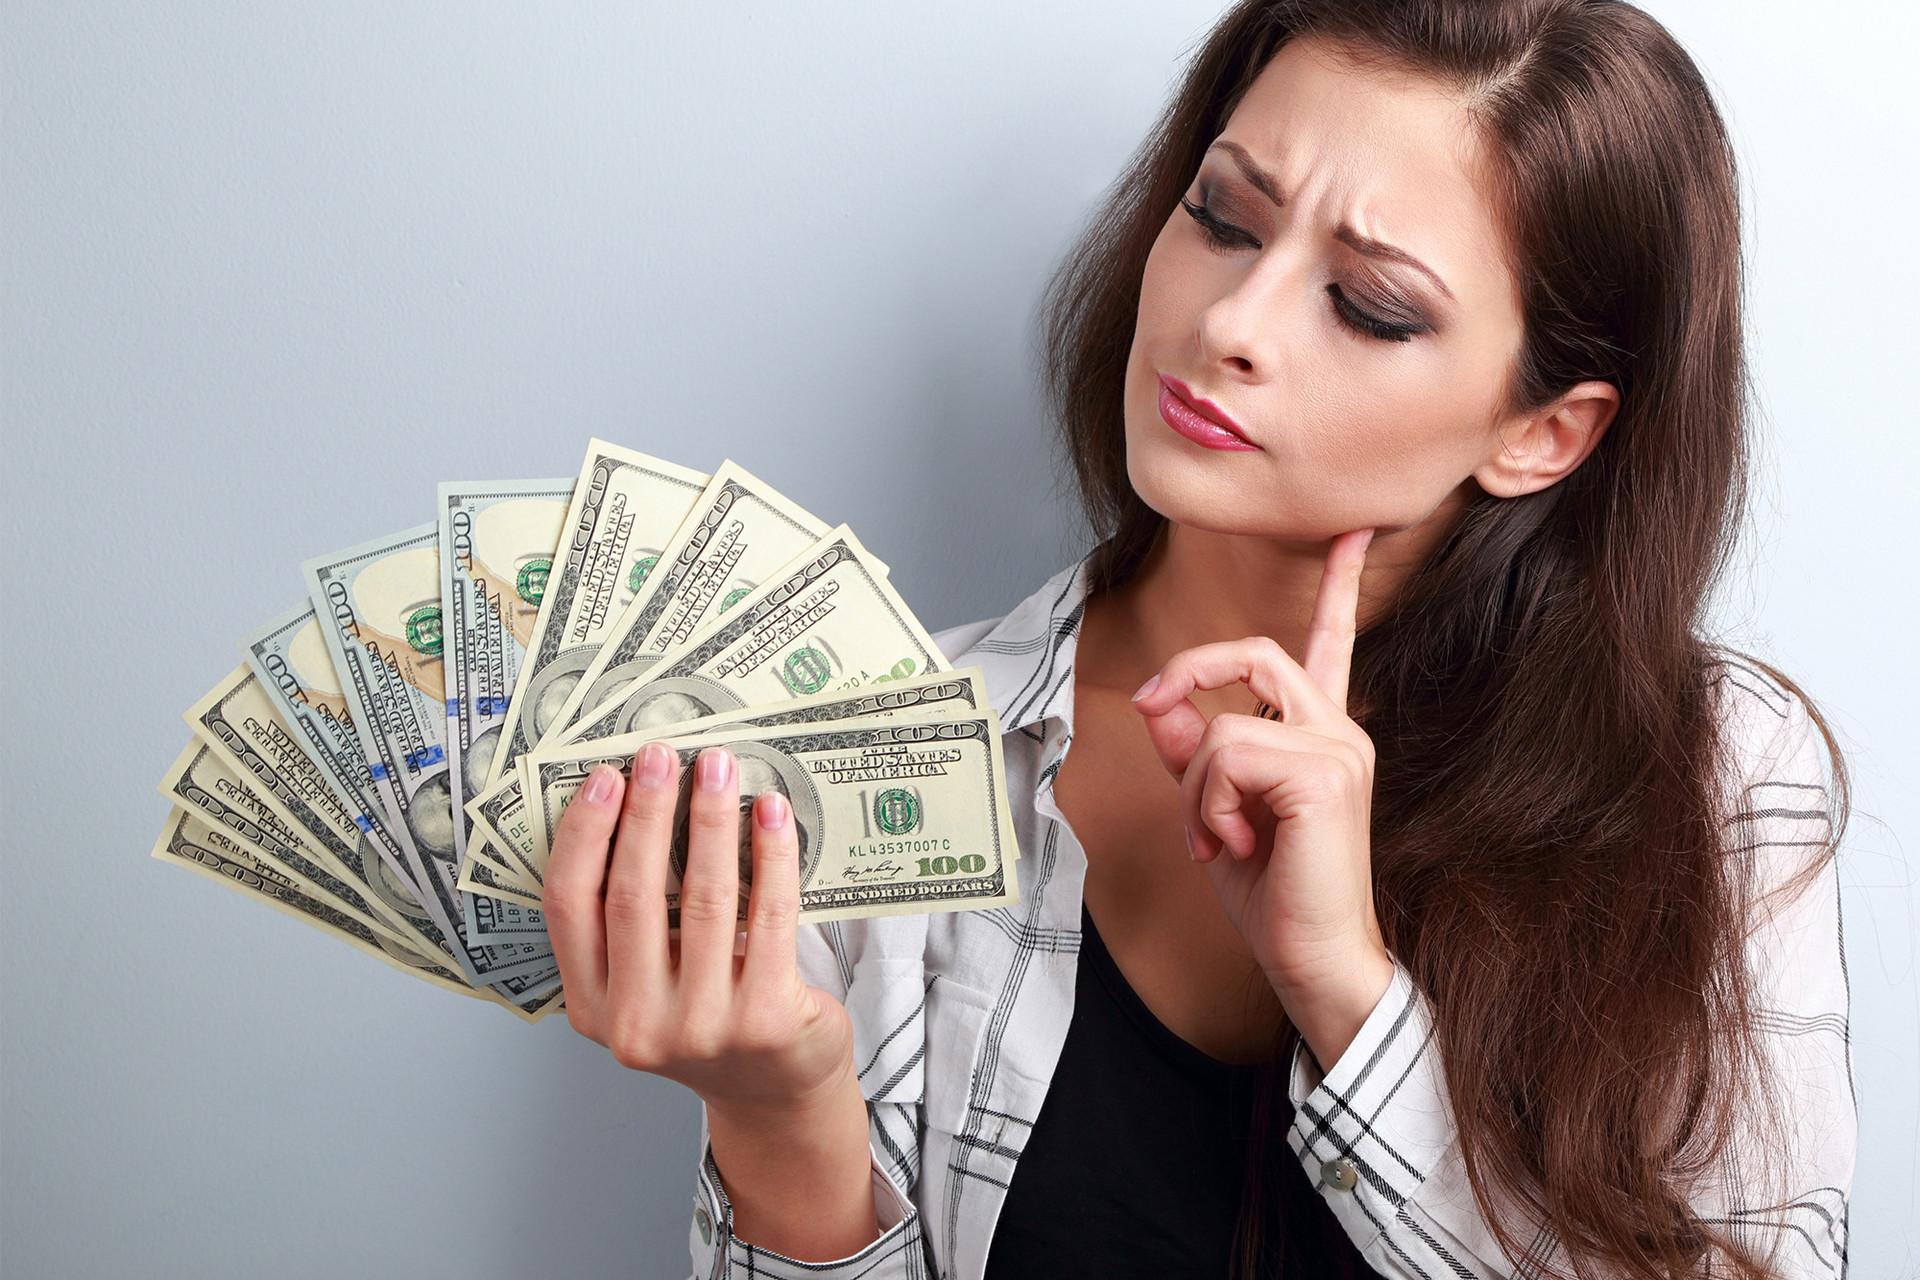 Картинки бизнес леди и деньги